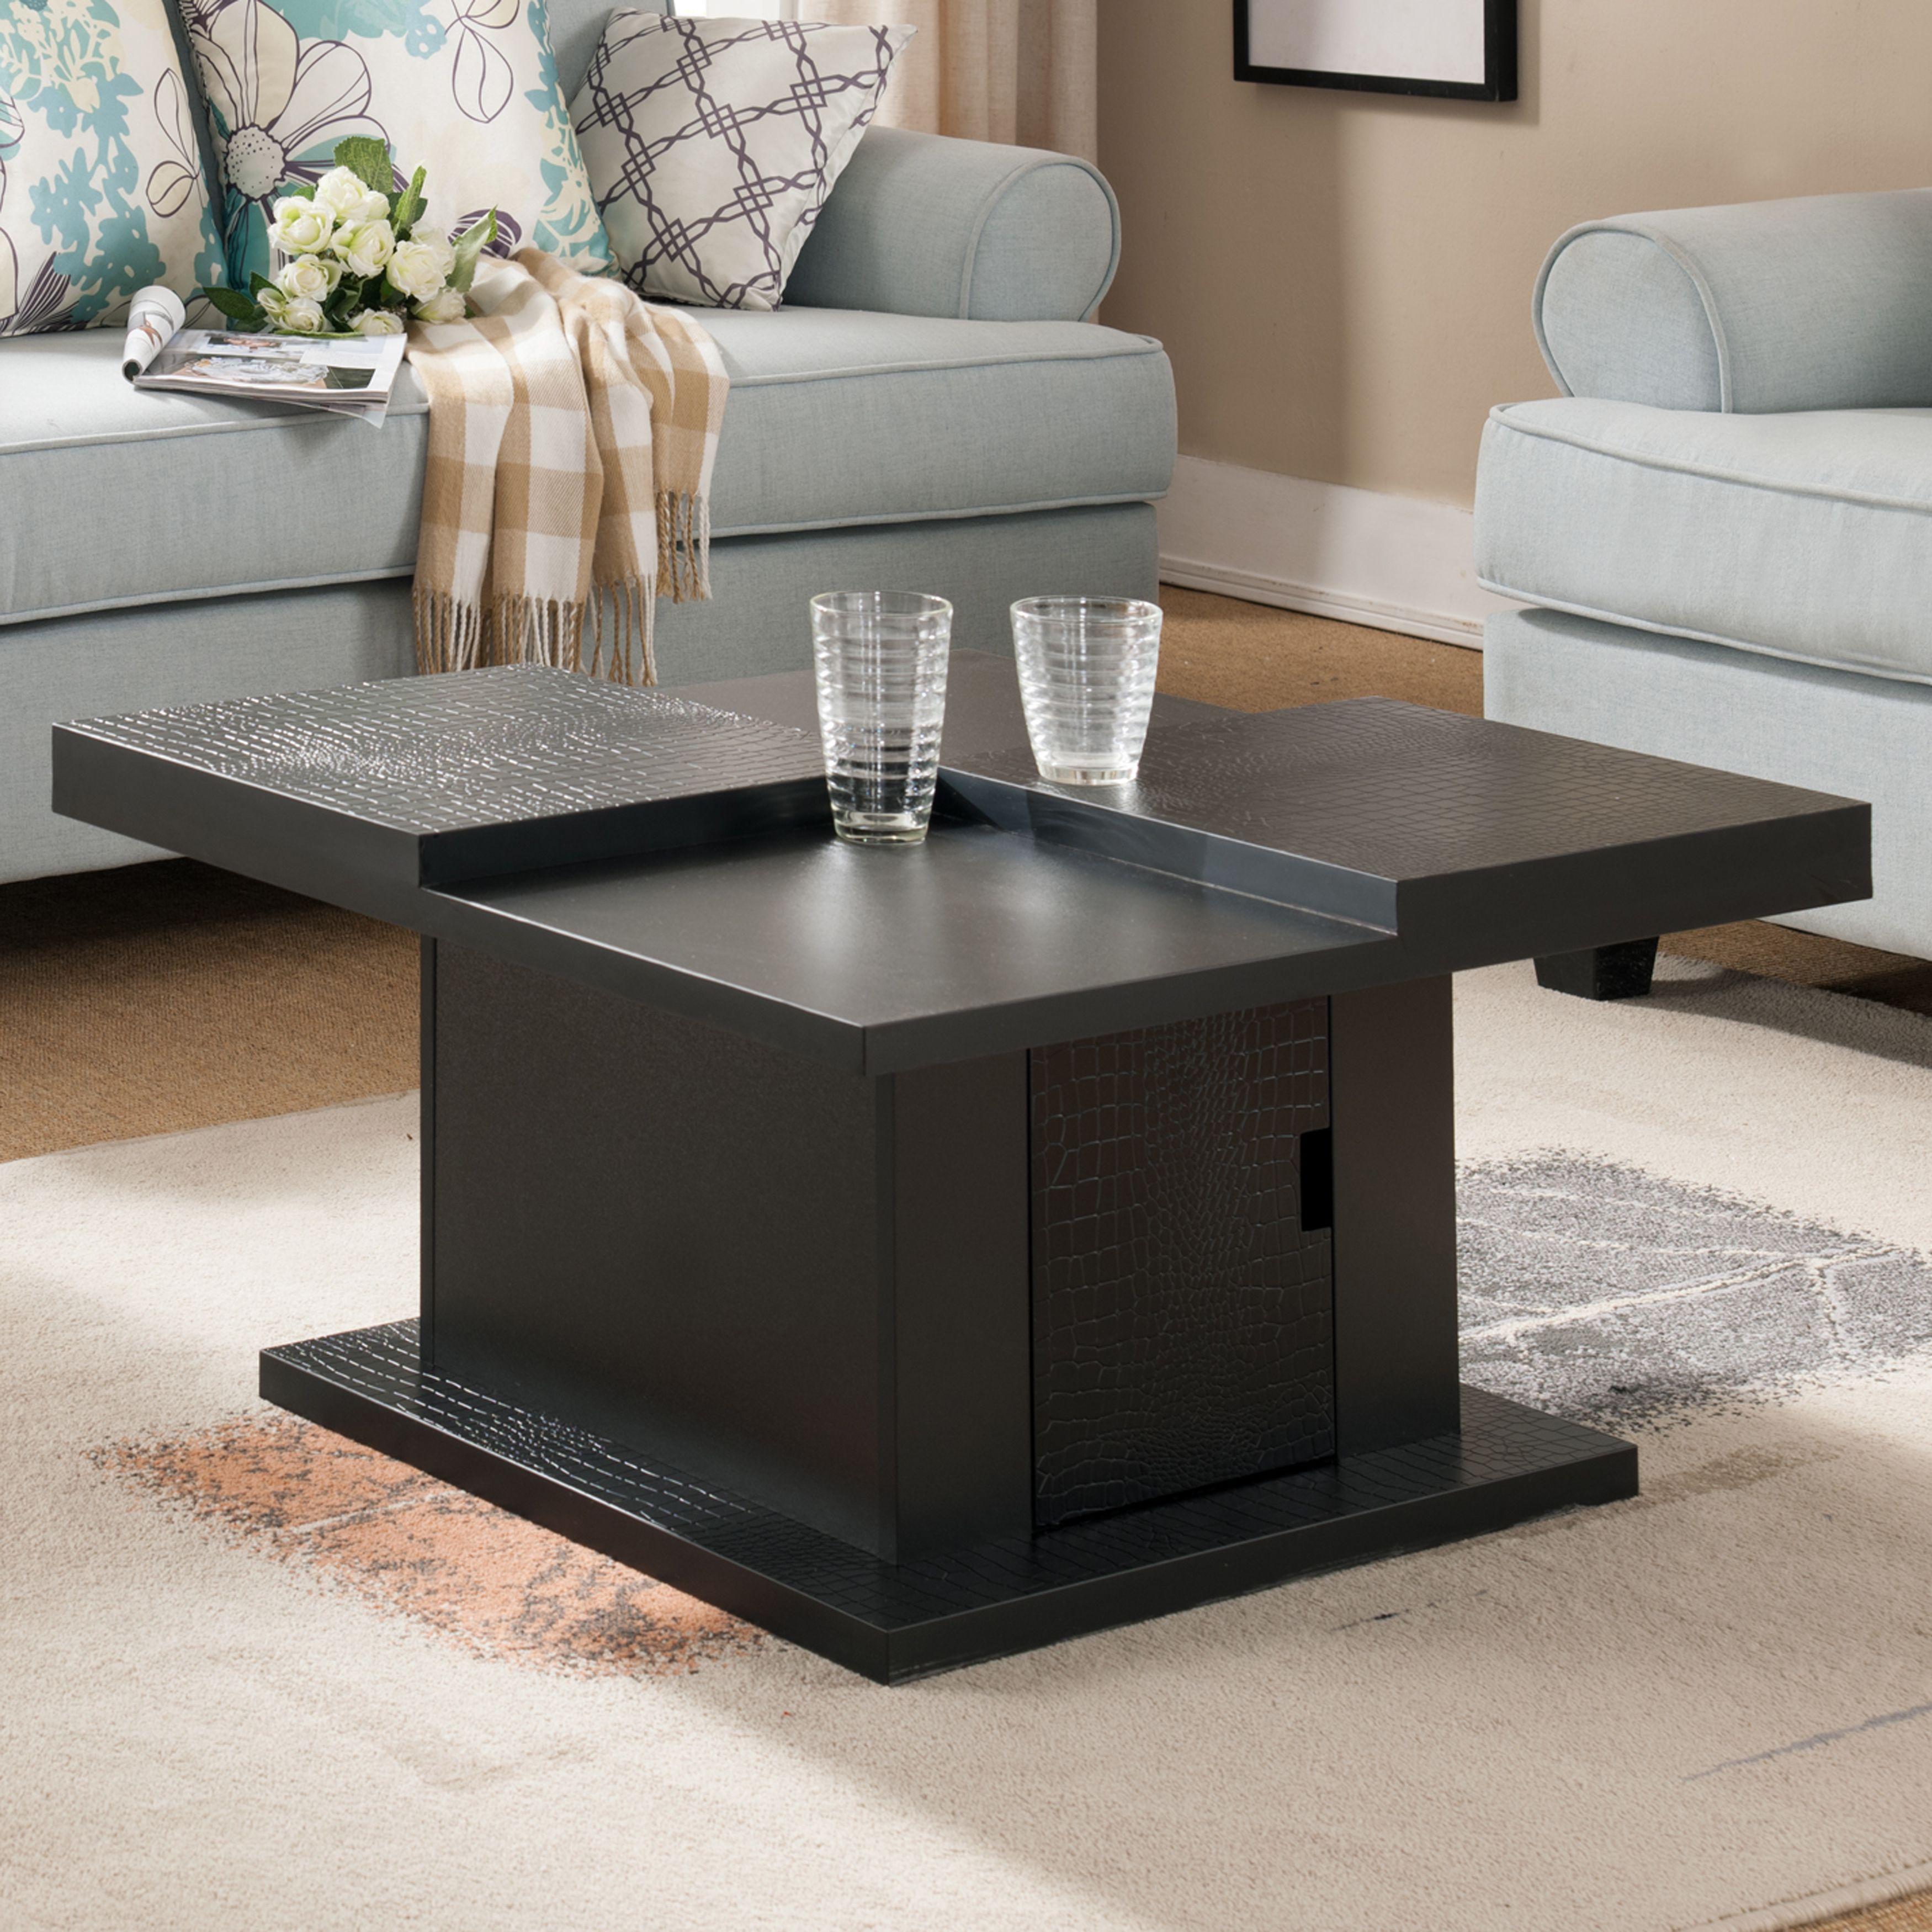 Furniture of America Croliz Modern Black Crocodile Textured Square